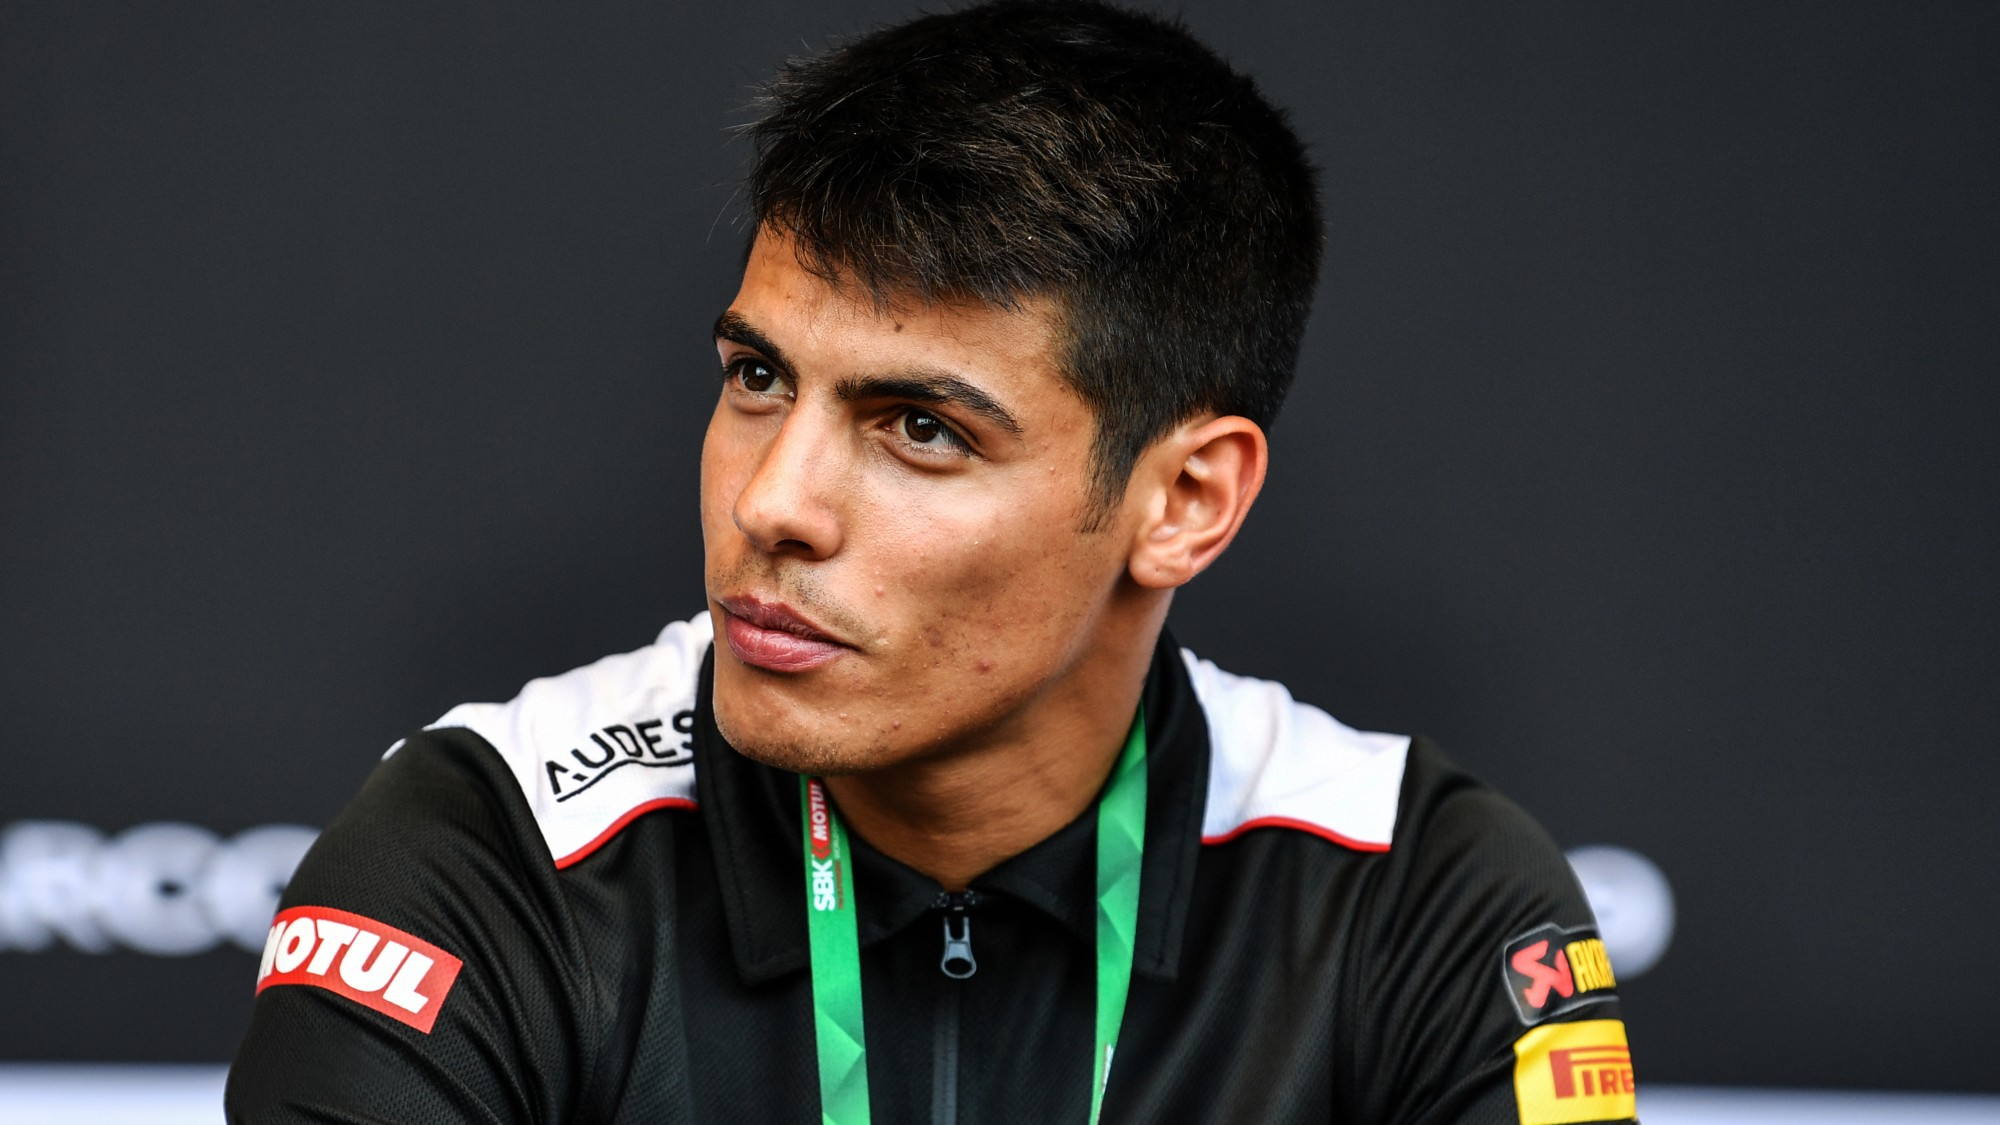 Rinaldi back in World Superbike with Goeleven Ducati for 2020